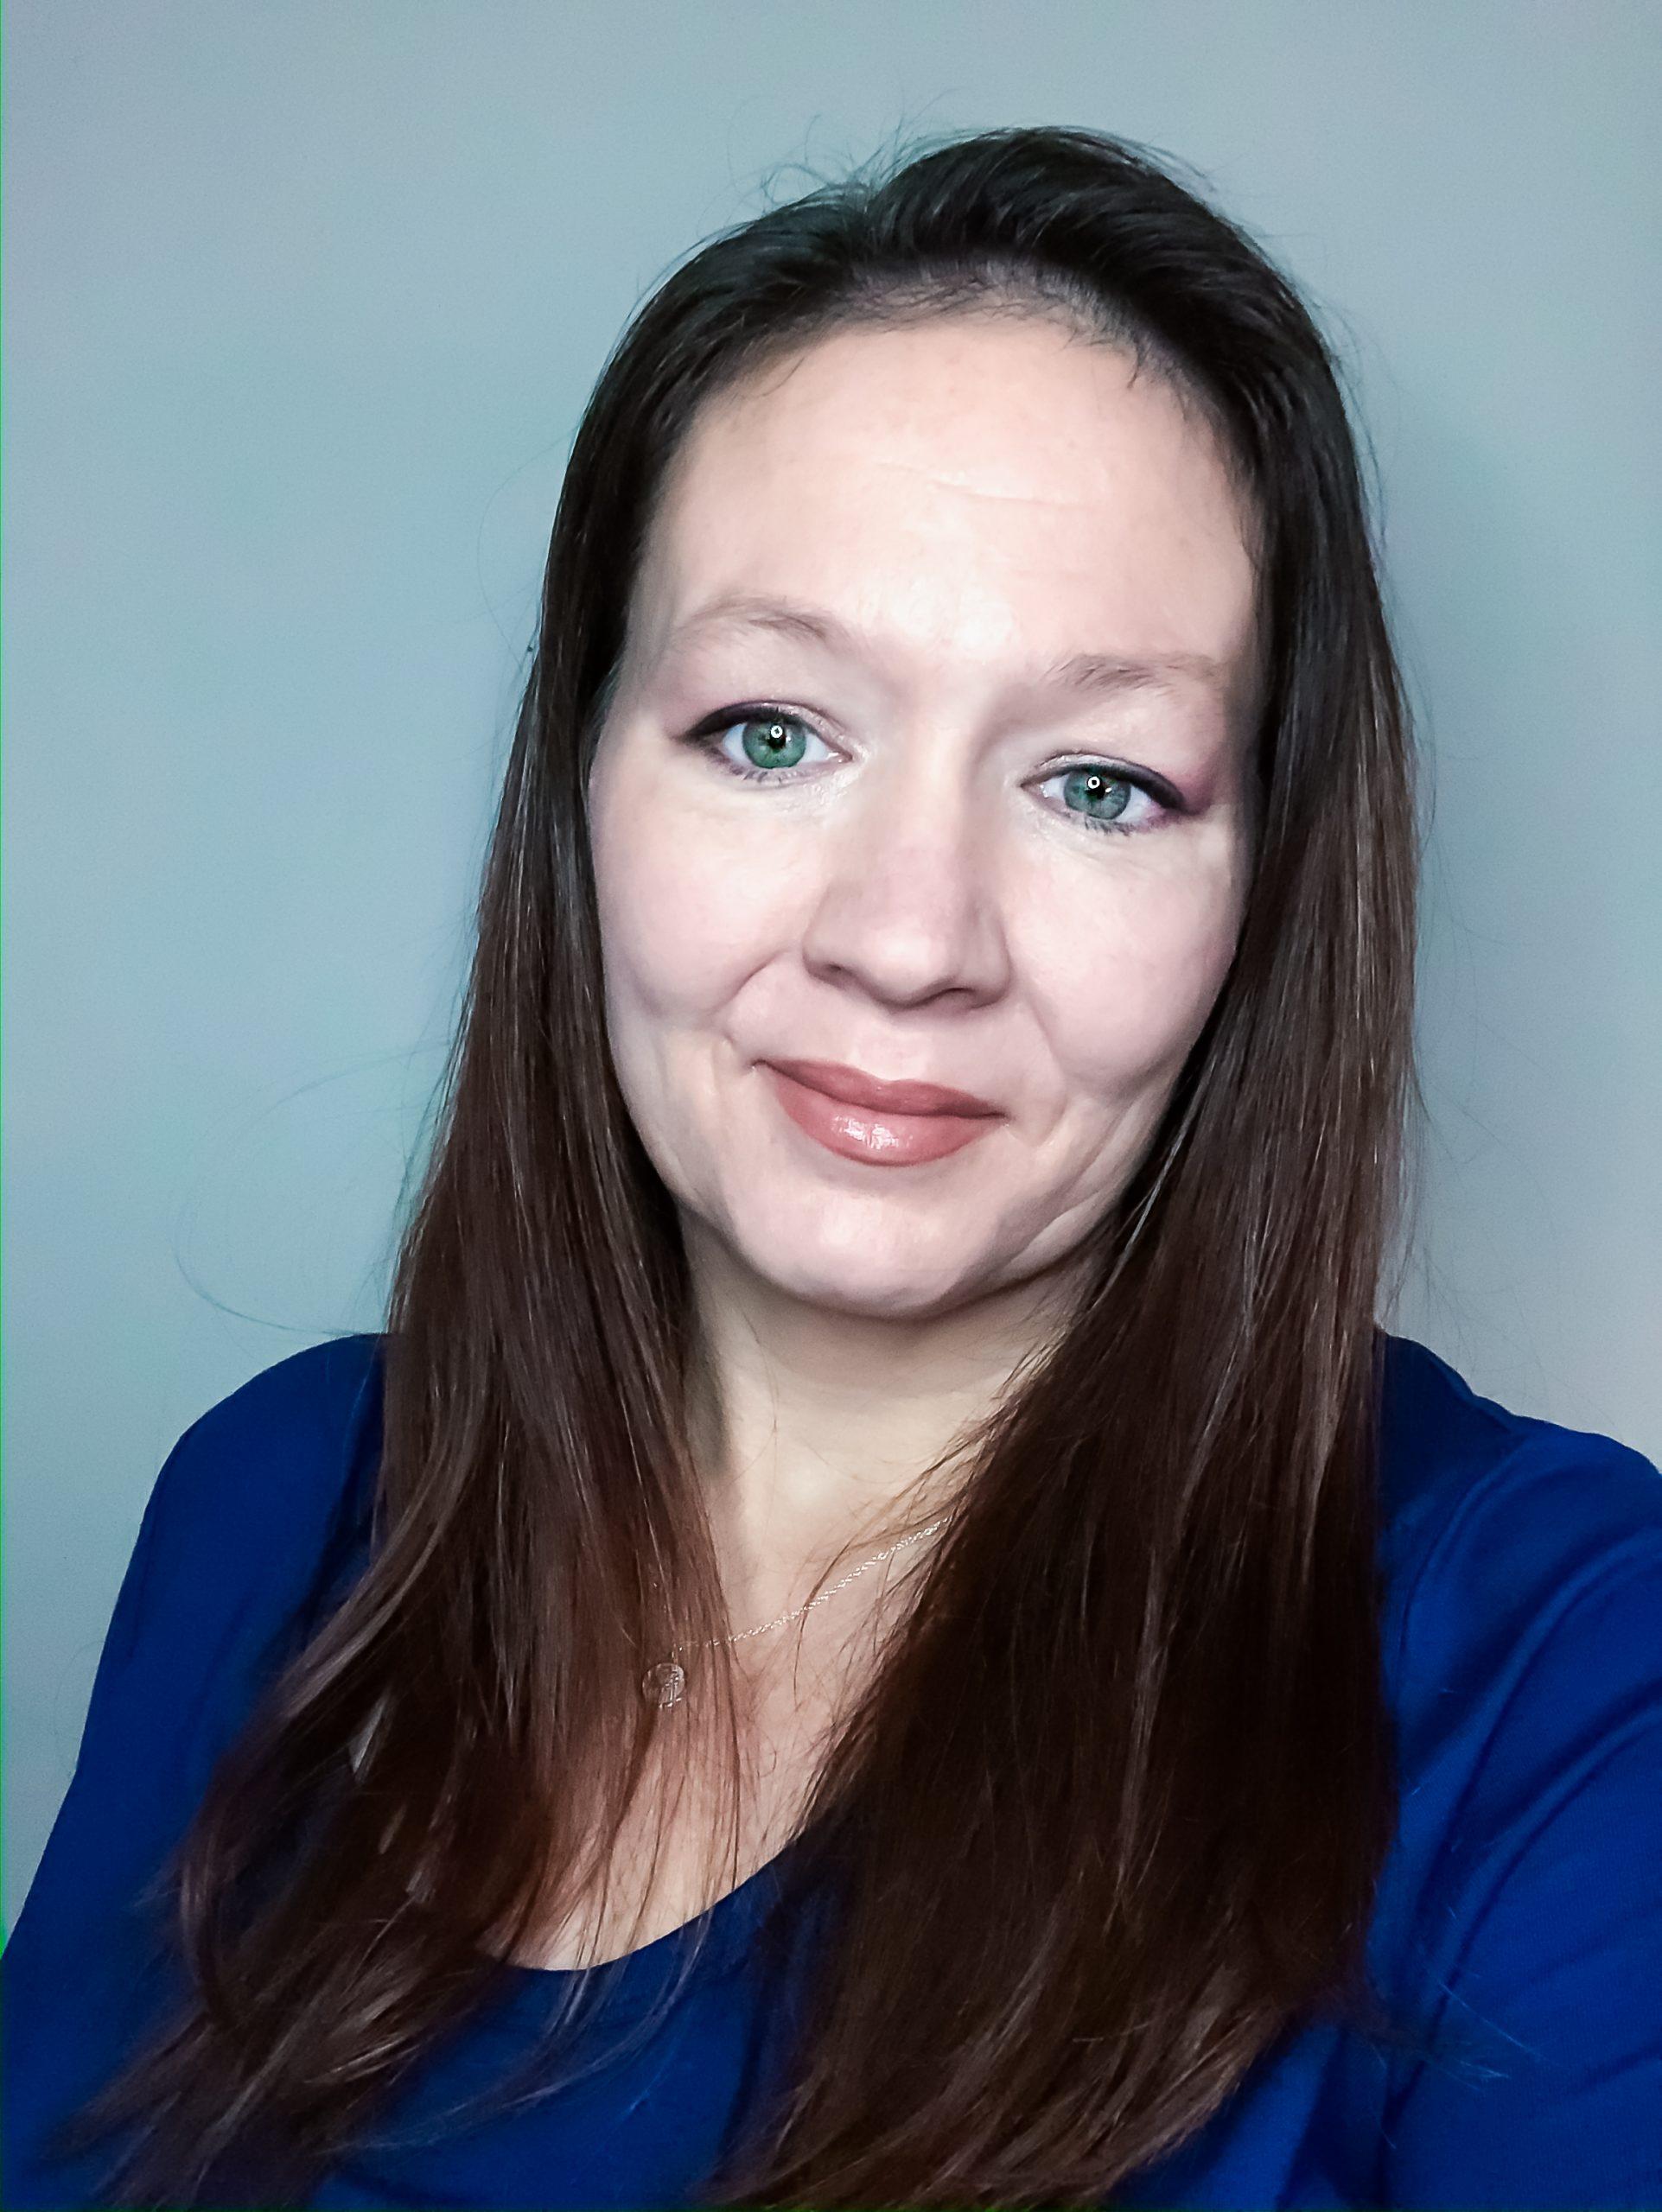 2020 US Army Women's Foundation 2020 Scholarship Recipient Kathleen Henry